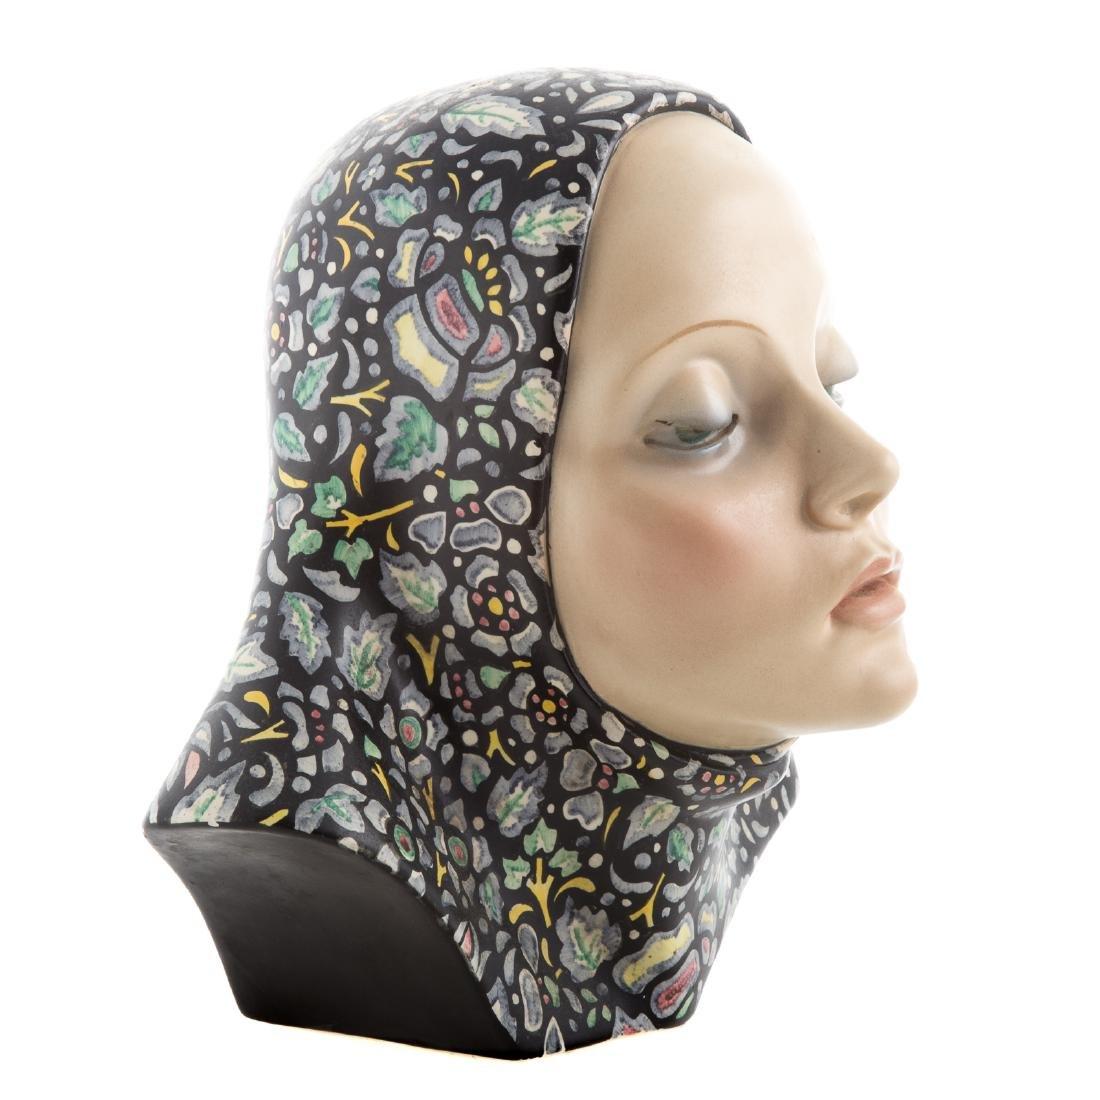 Lence glazed ceramic bust of woman - 2